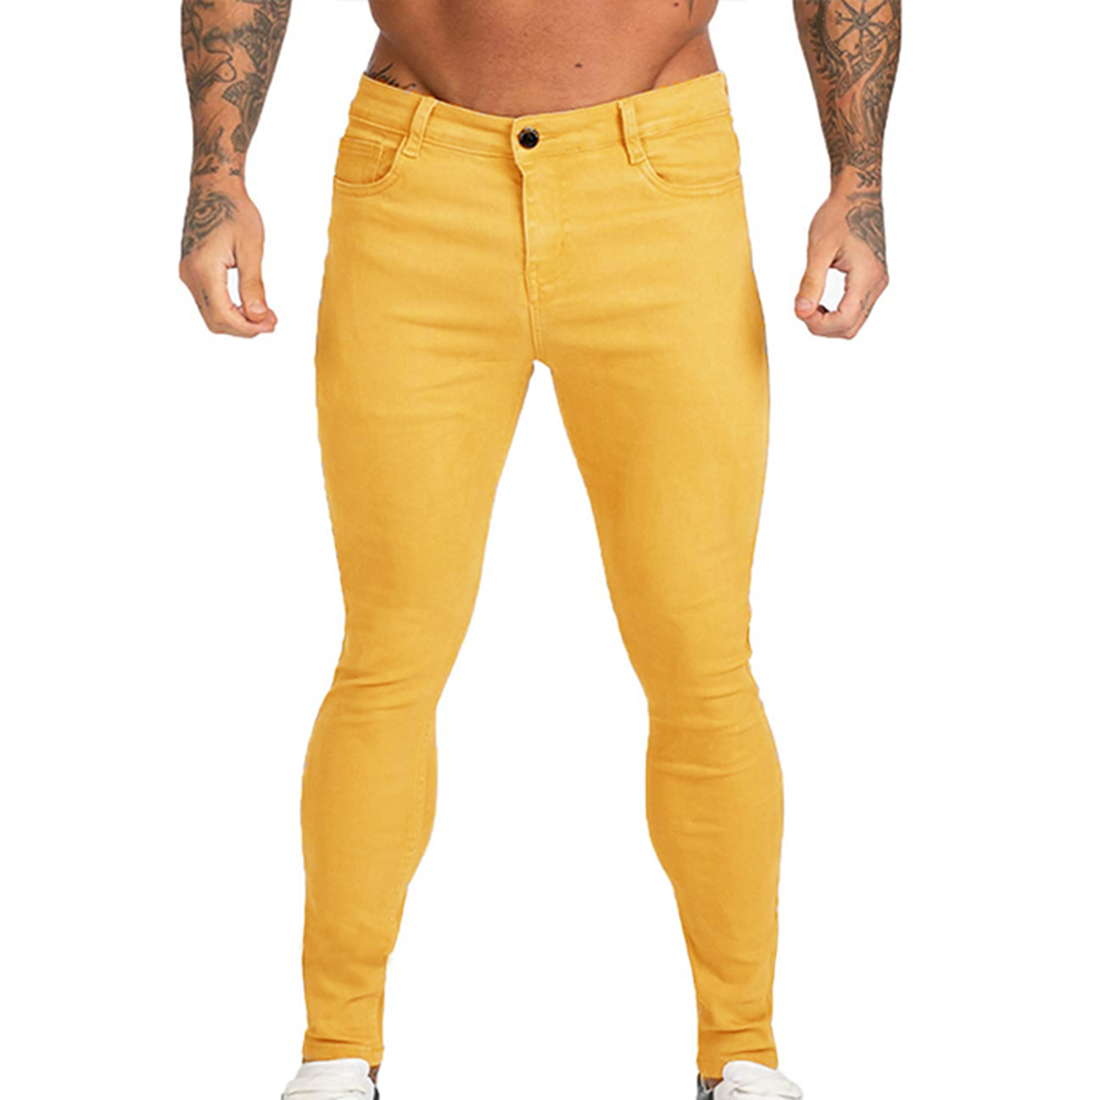 2020 Men Stylish Solid Jeans Pants Biker Skinny Slim Fit Straight Denim Trousers Men Hip Hop Streetwear Pencil Pants